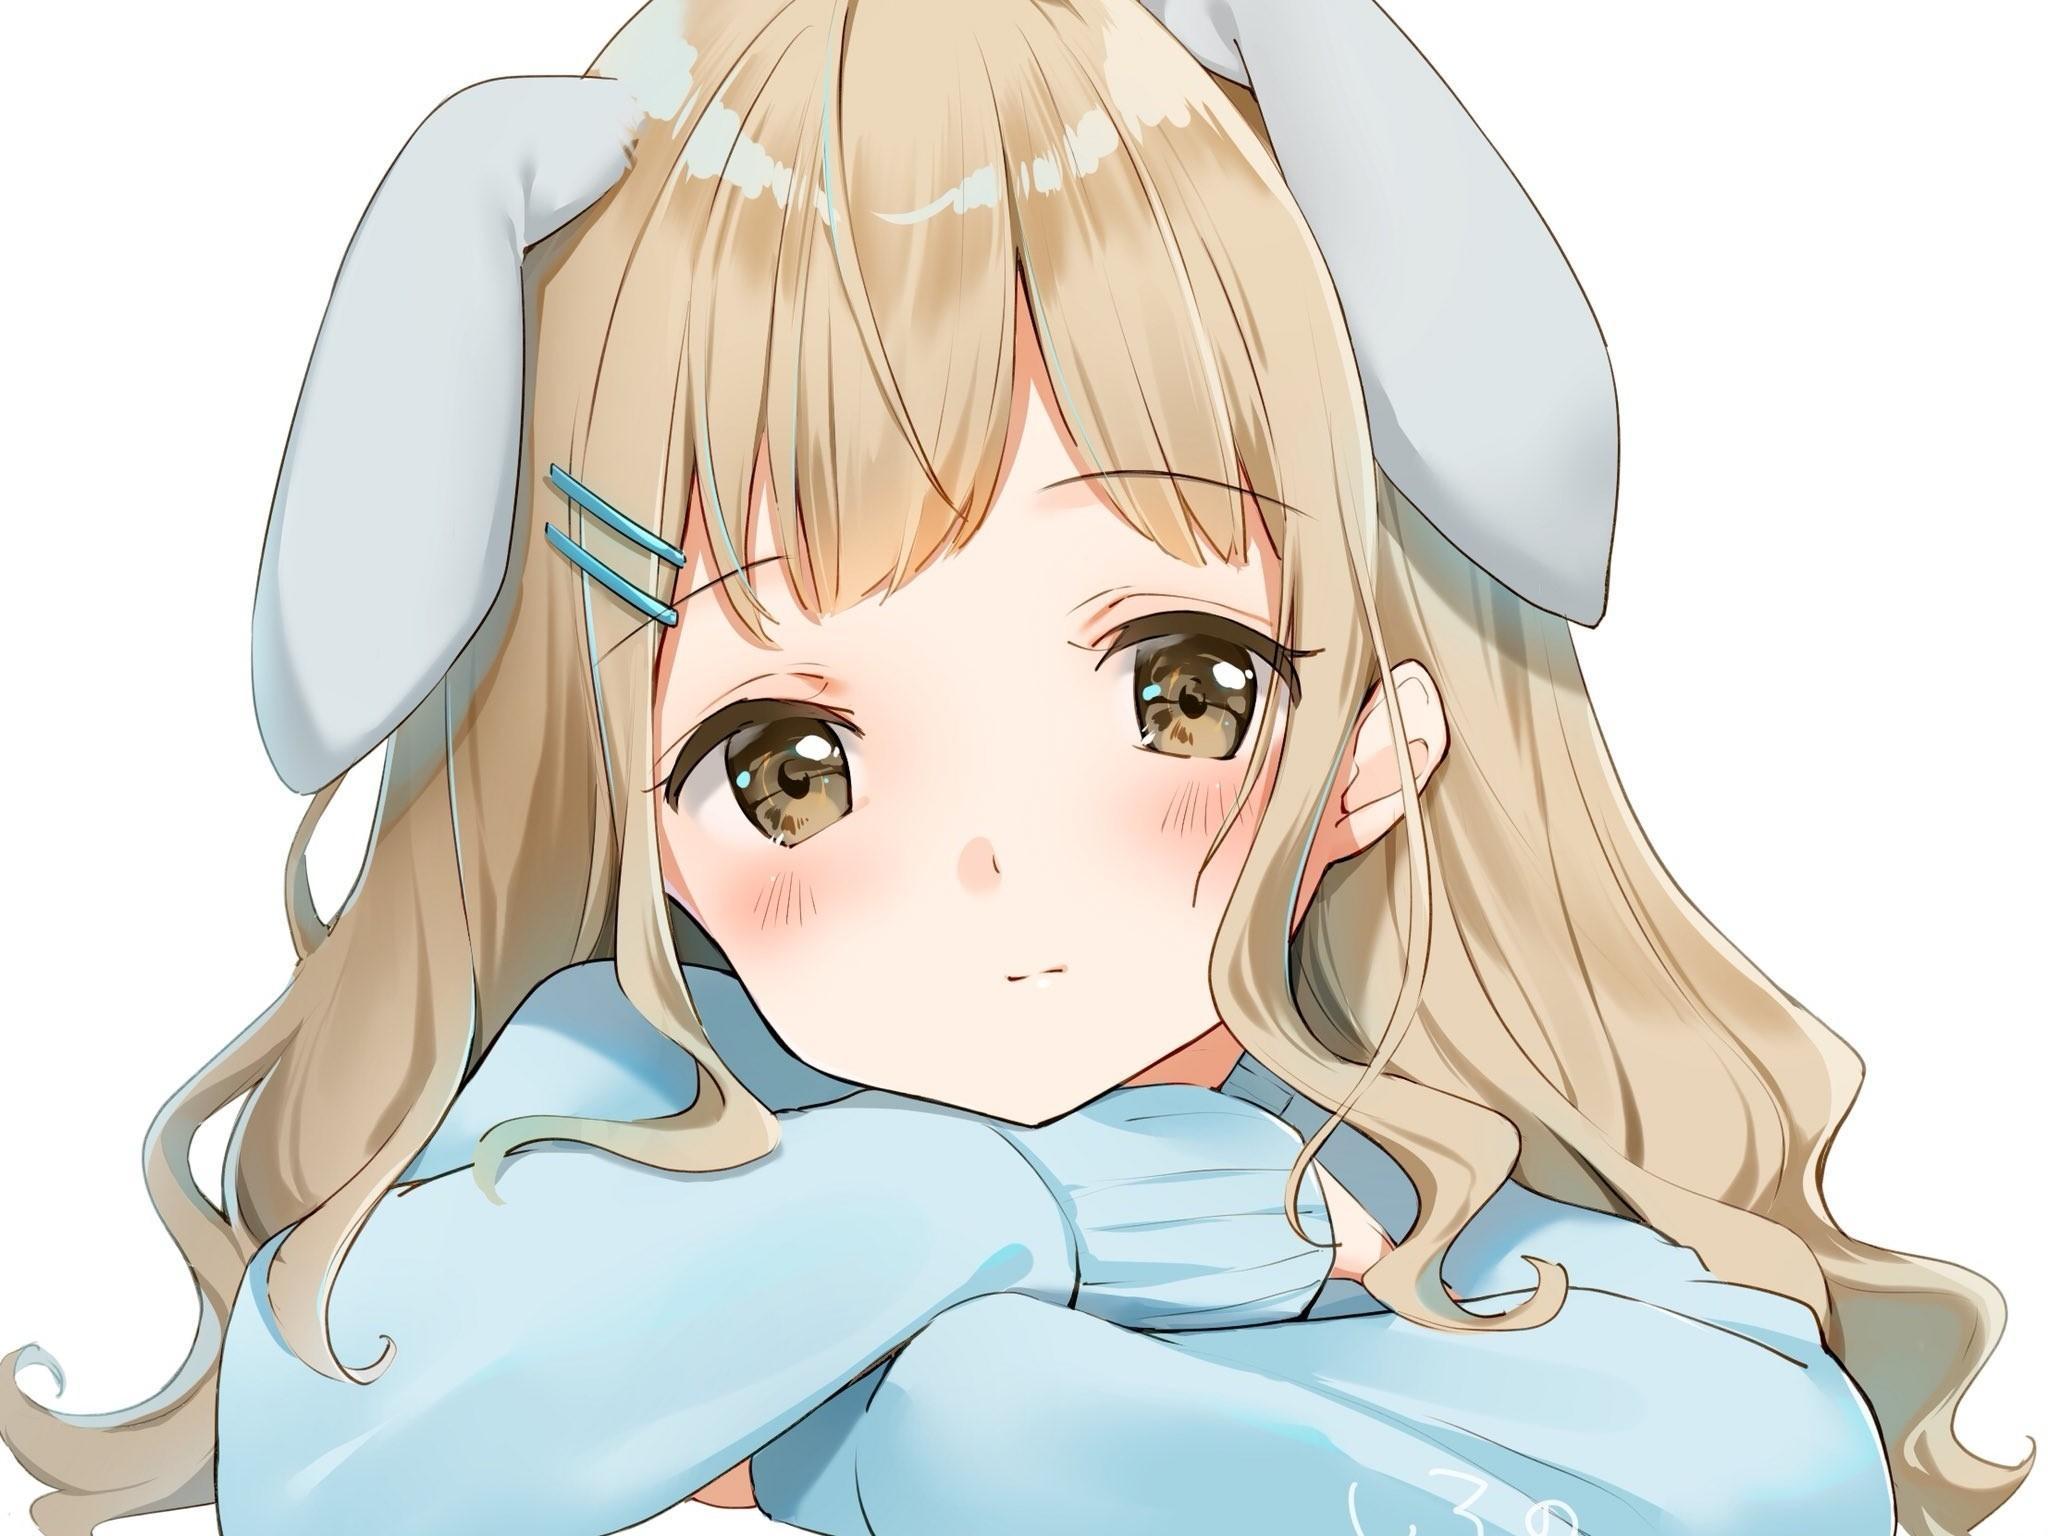 Long Hair Anime Girl Wallpapers - Wallpaper Cave